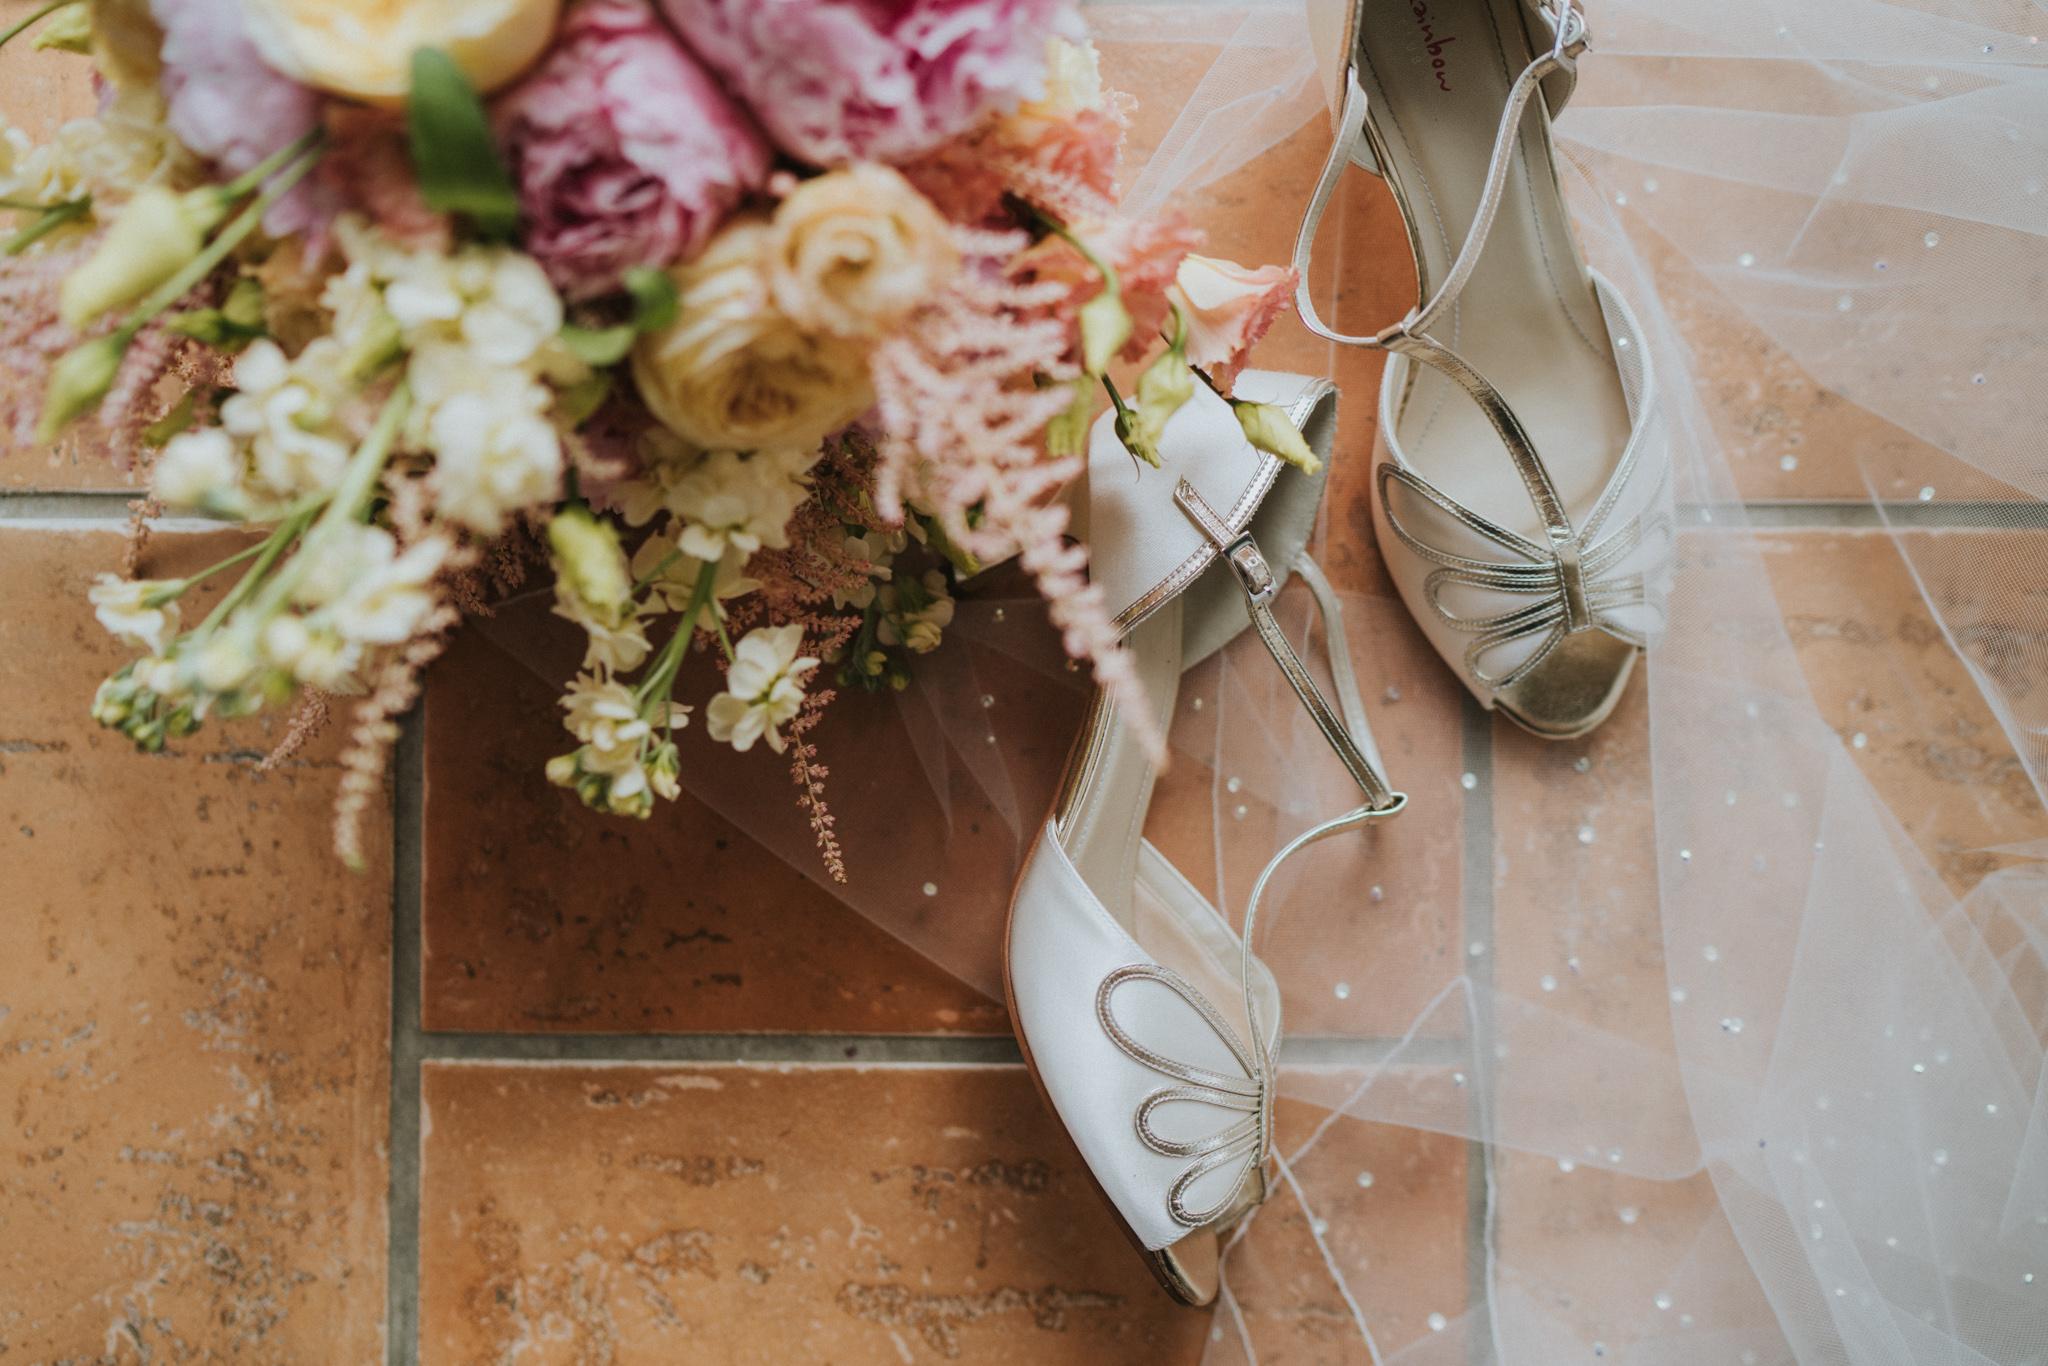 danielle-and-gareths-boho-wedding-previews-at-high-house-weddings-grace-elizabeth-colchester-essex-suffolk-norfolk-devon-alternative-wedding-and-lifestyle-photographer (8 of 76).jpg